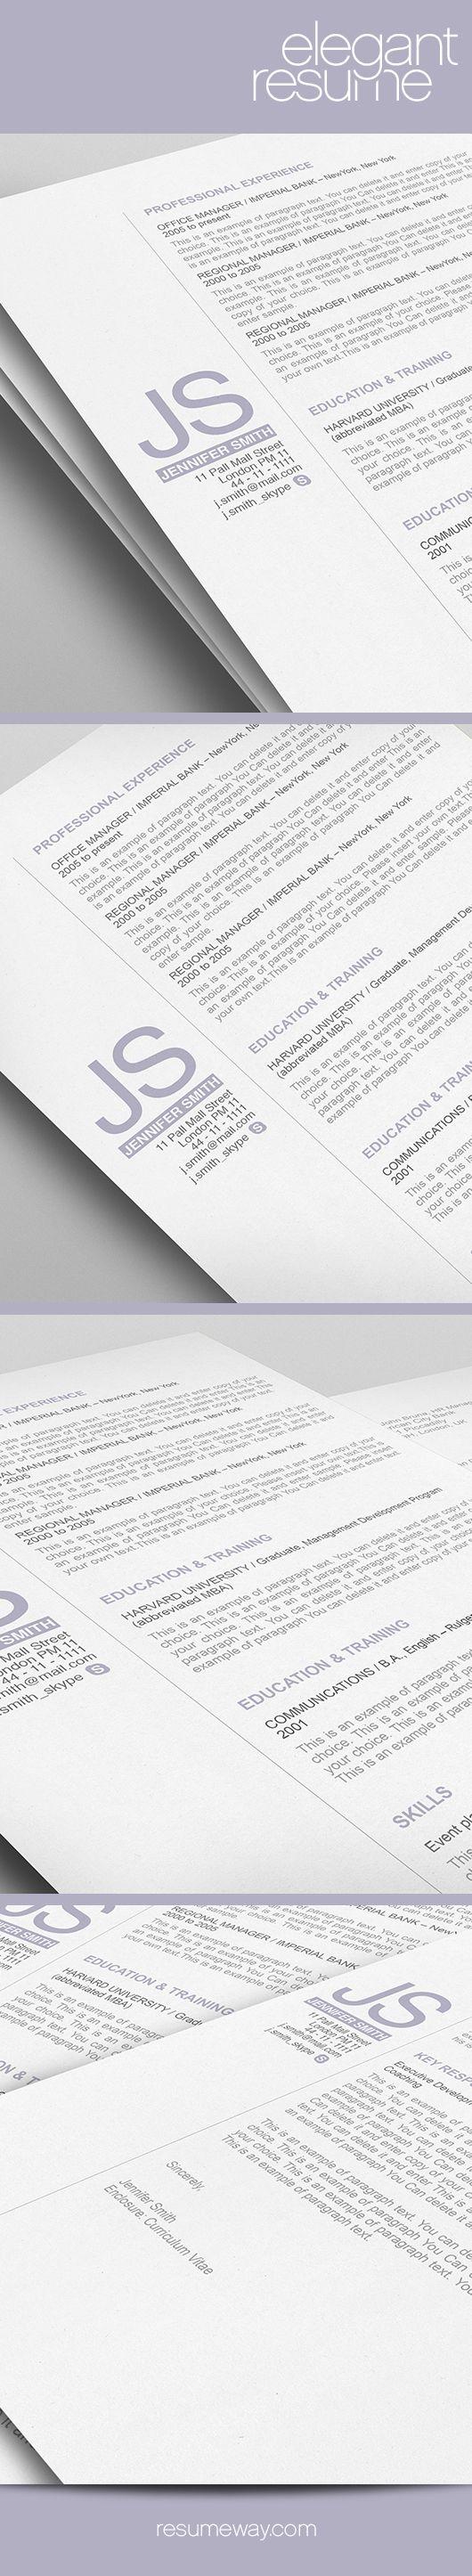 17 best images about elegant resume templates on pinterest resume